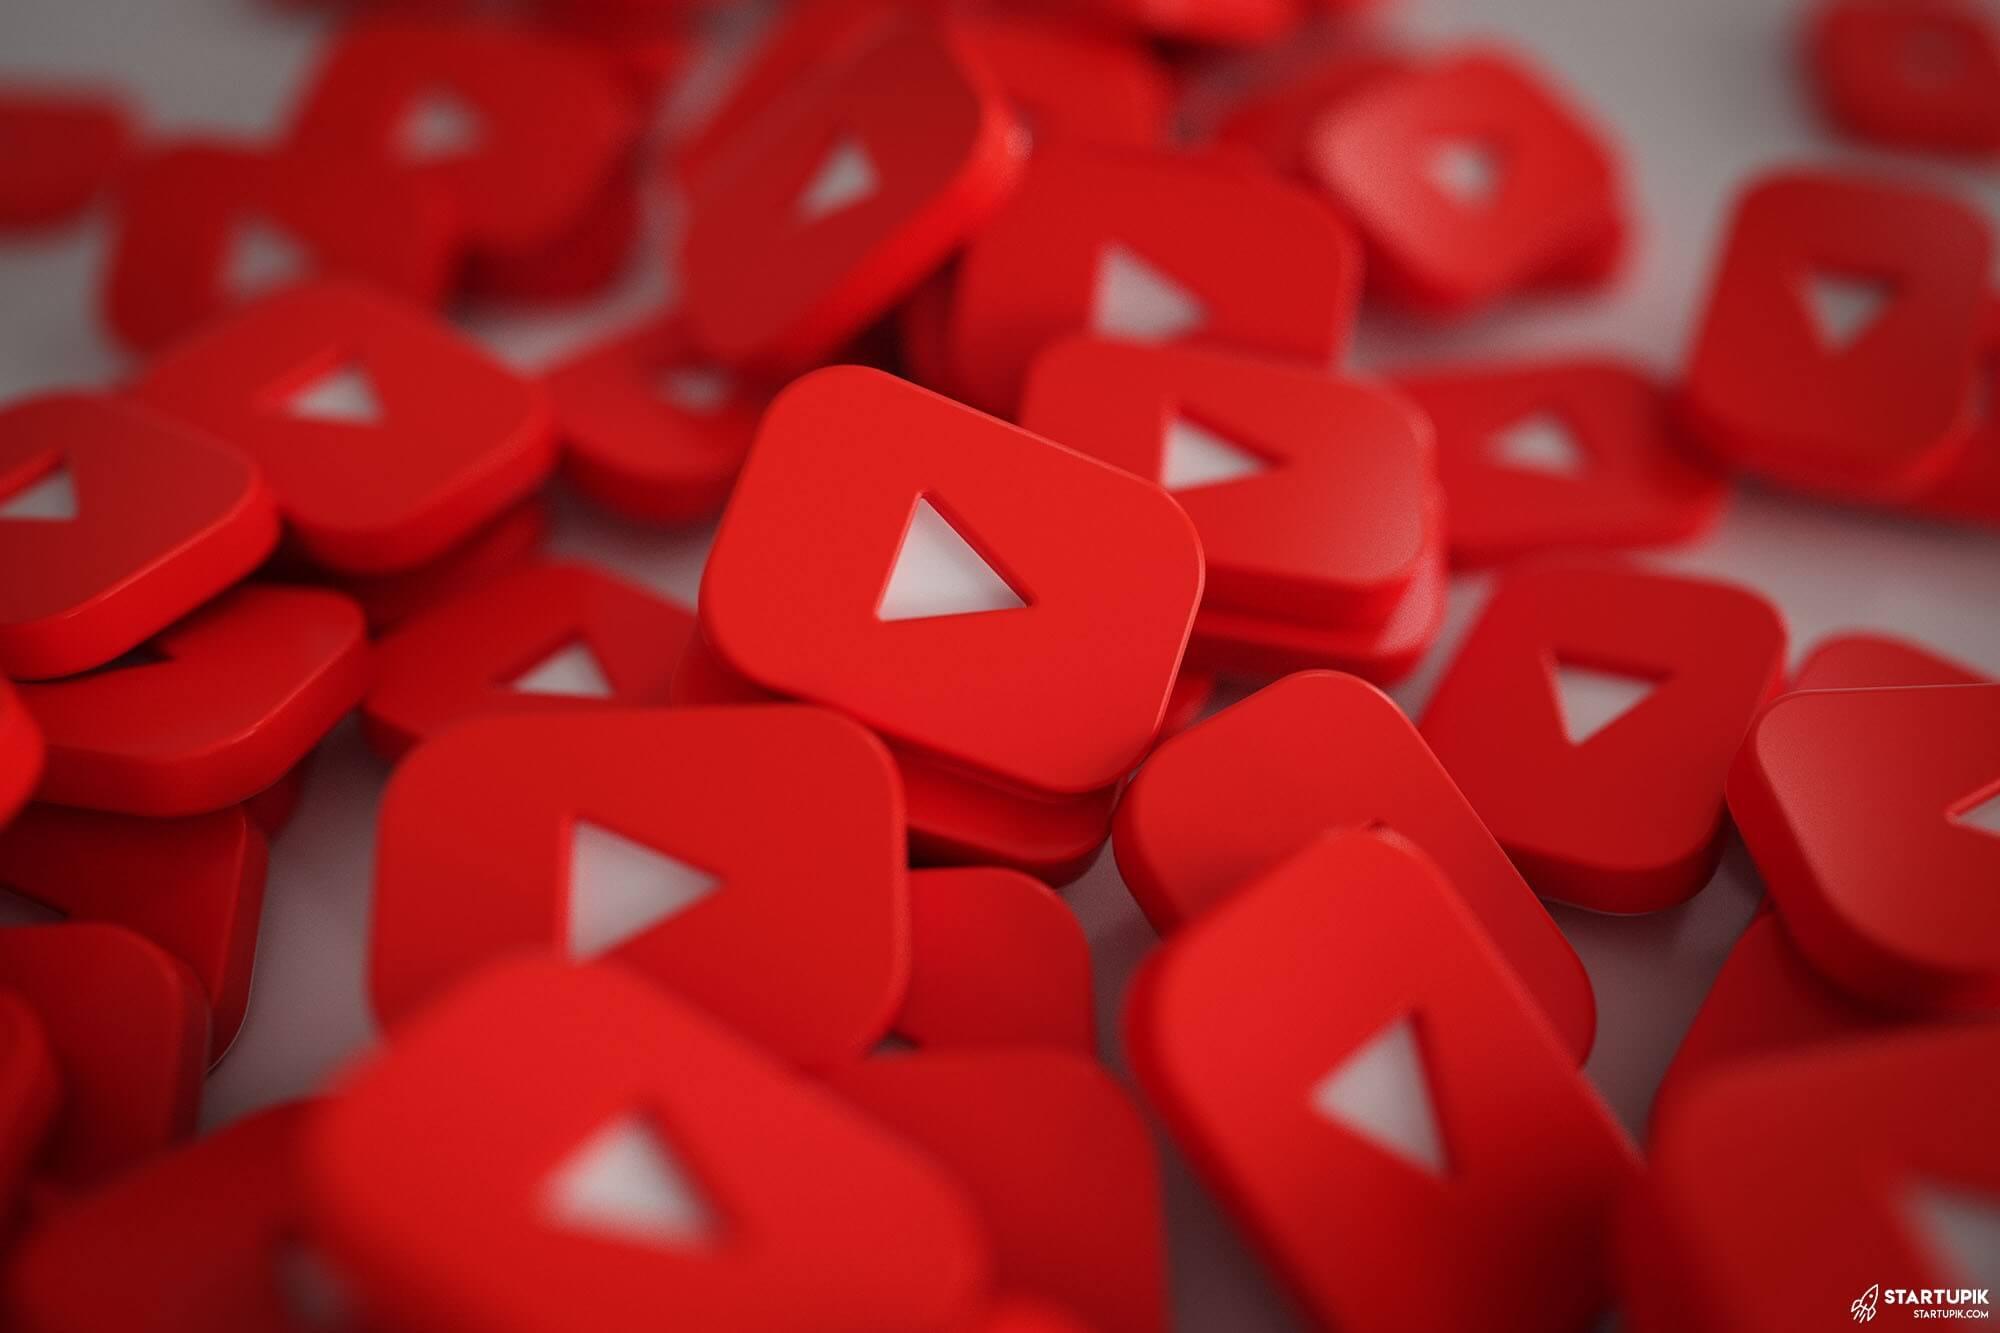 Youtube analytic